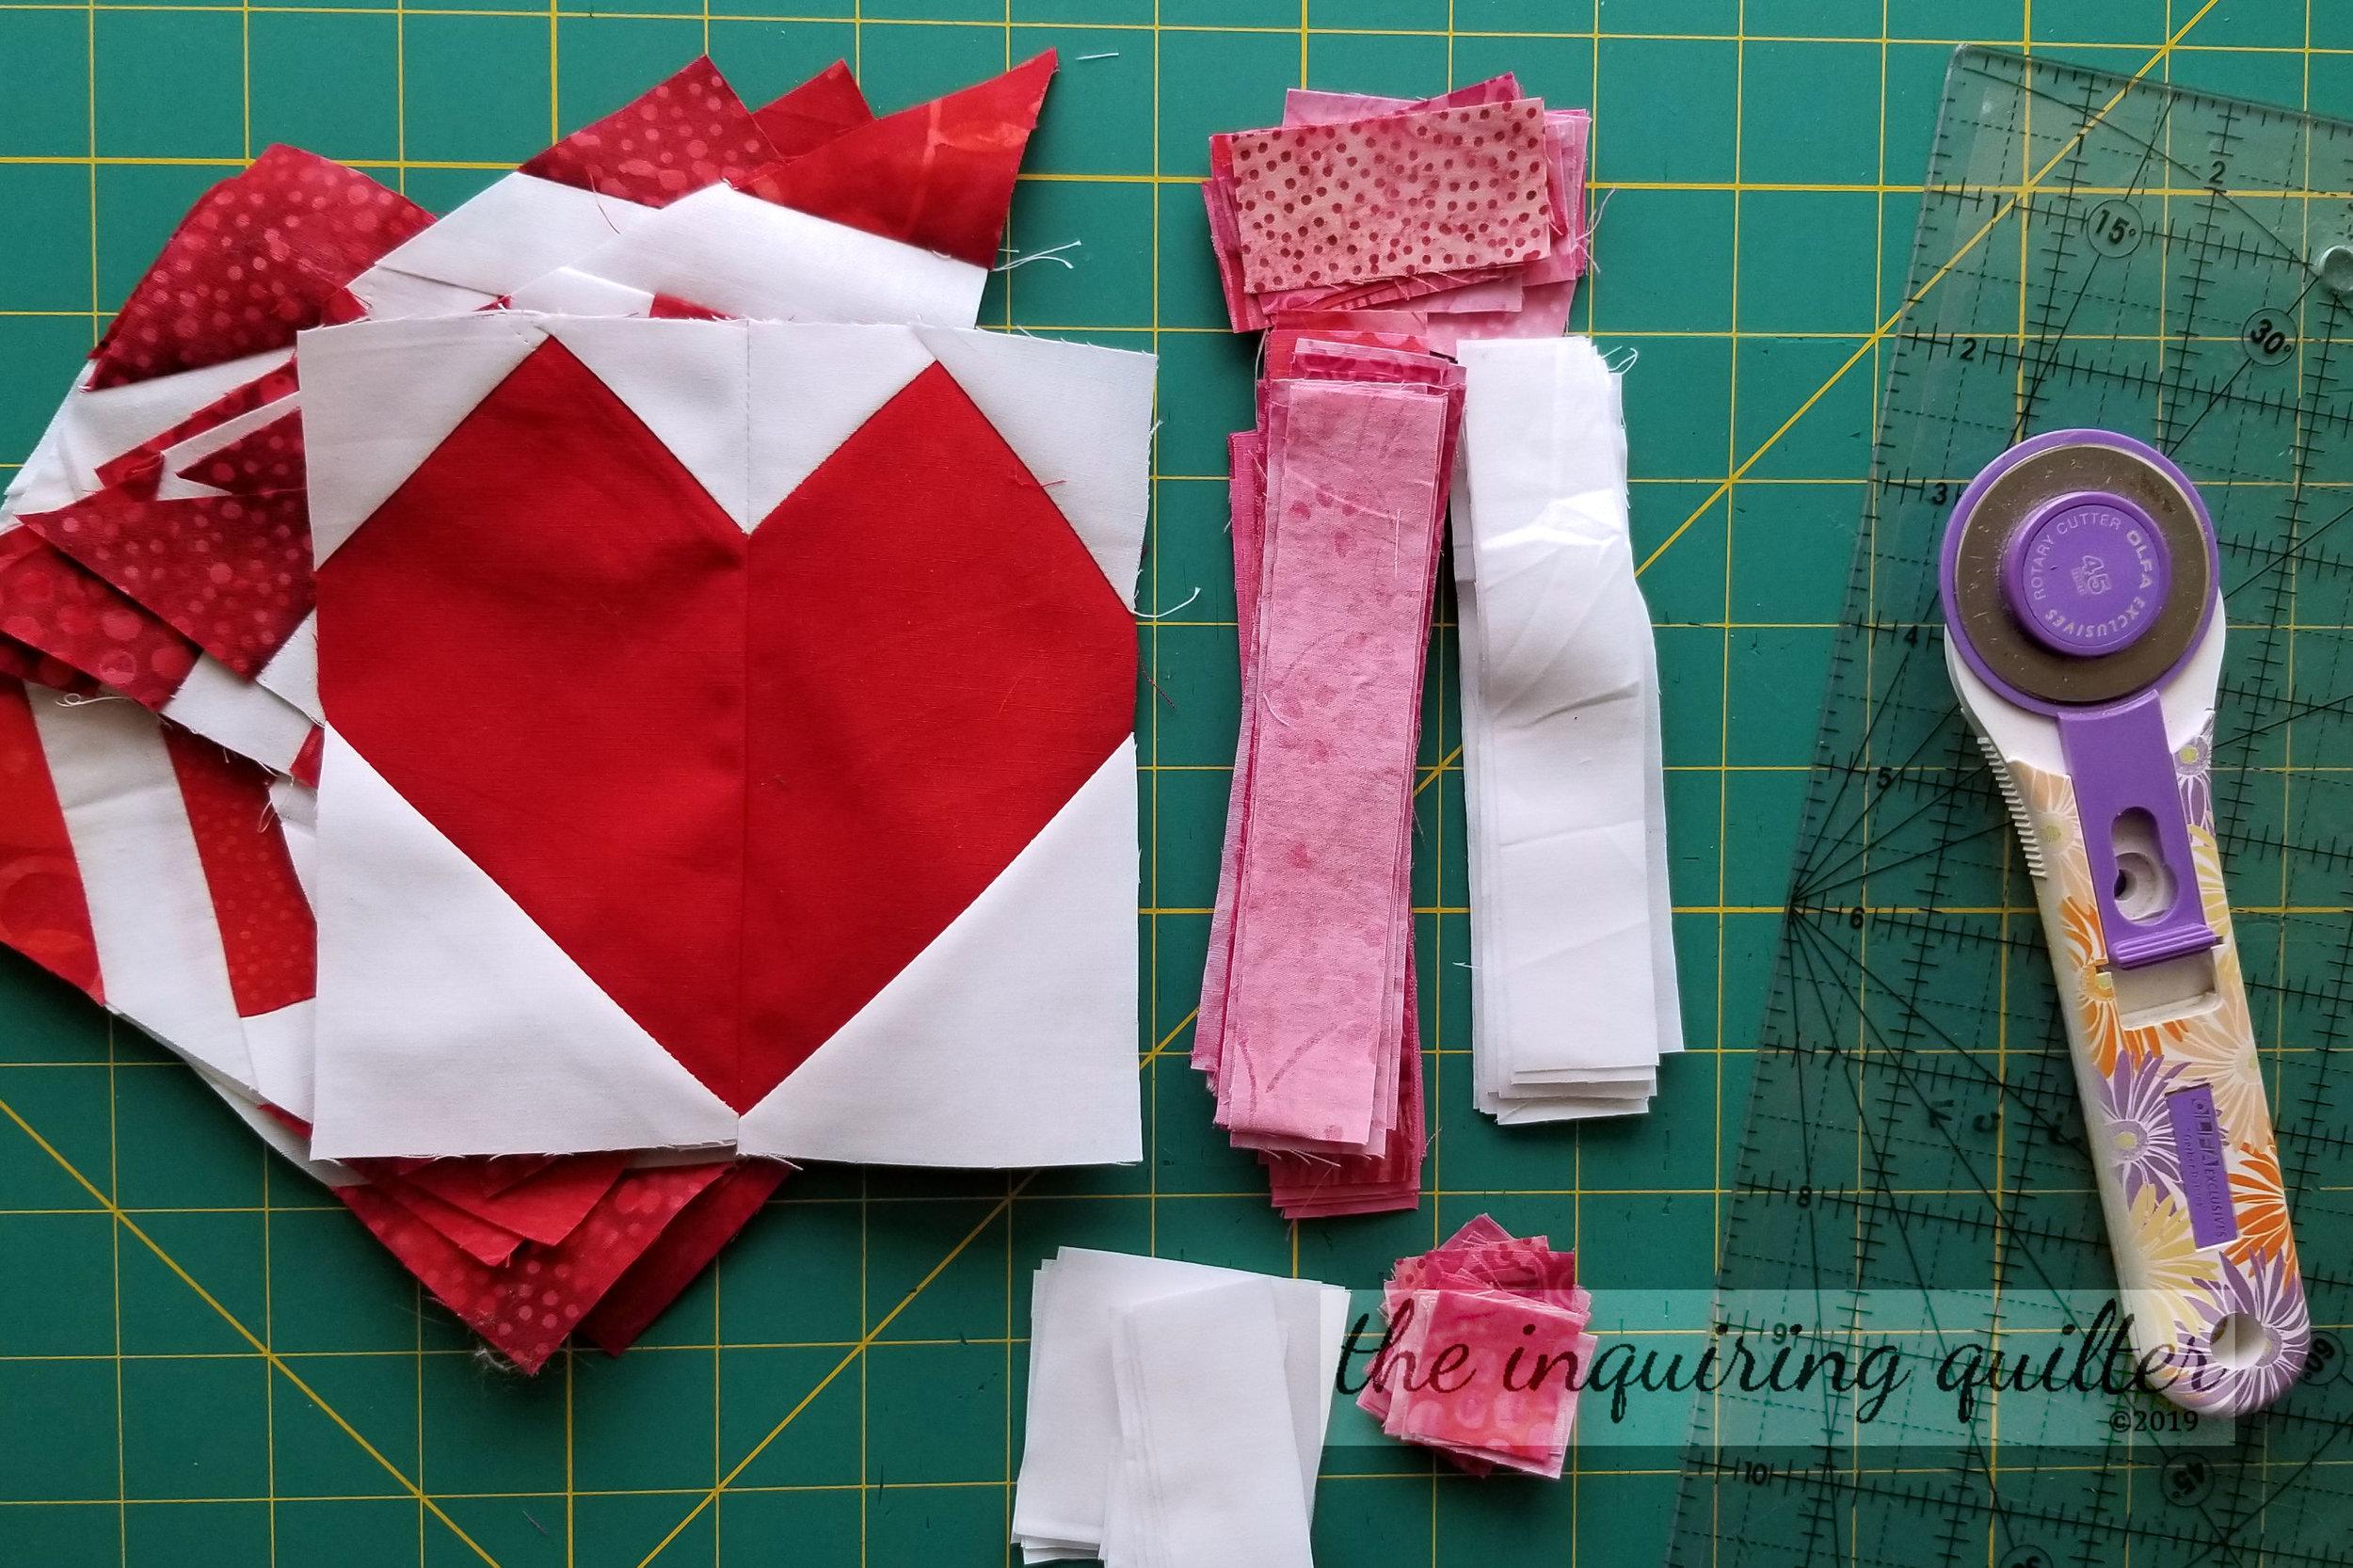 Cutting fabrics 2.jpg